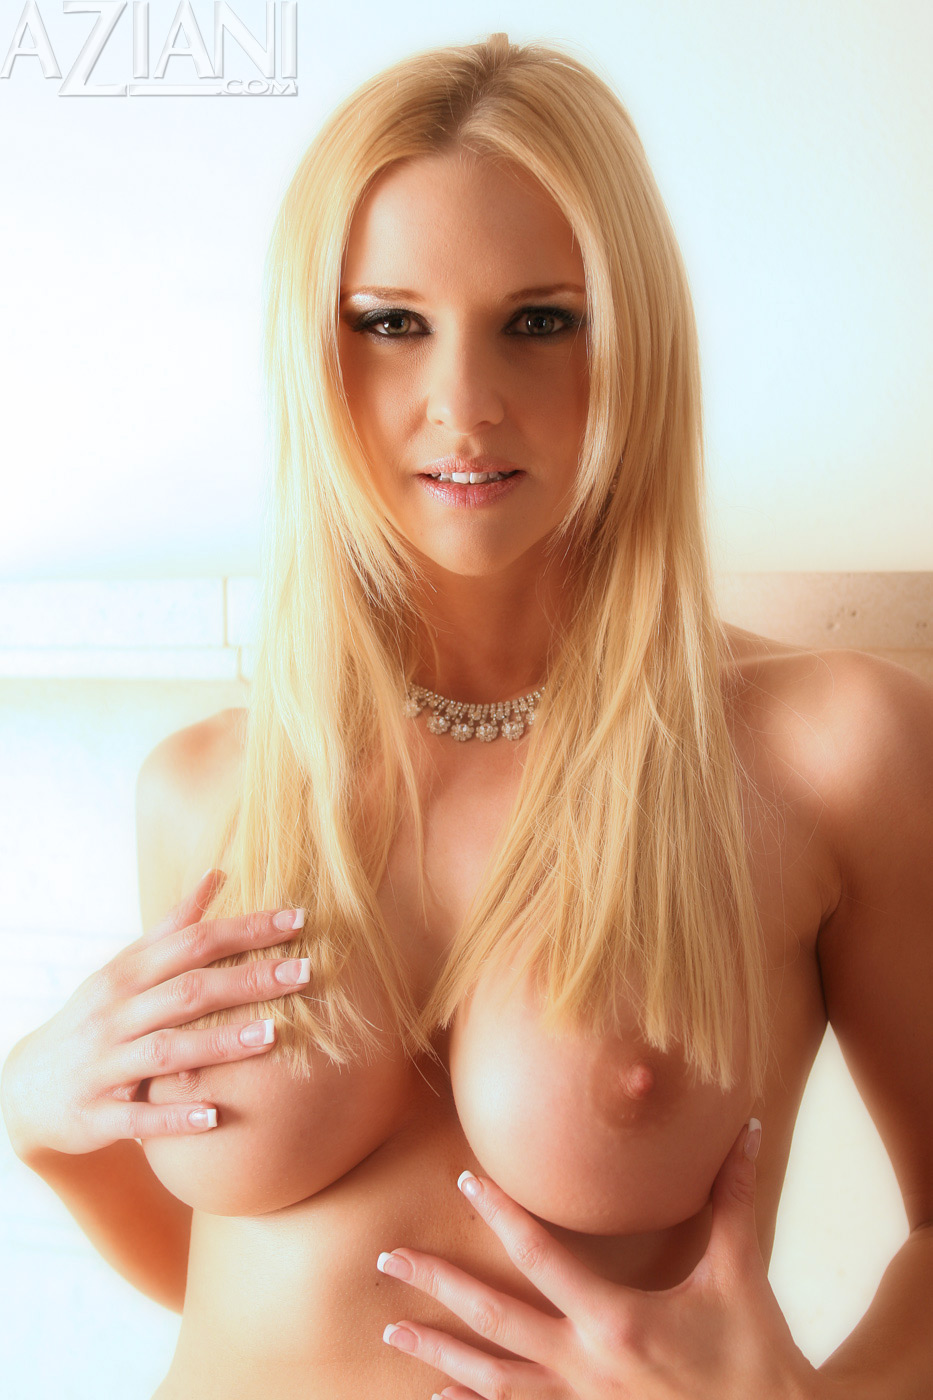 Erotic mature picture woman